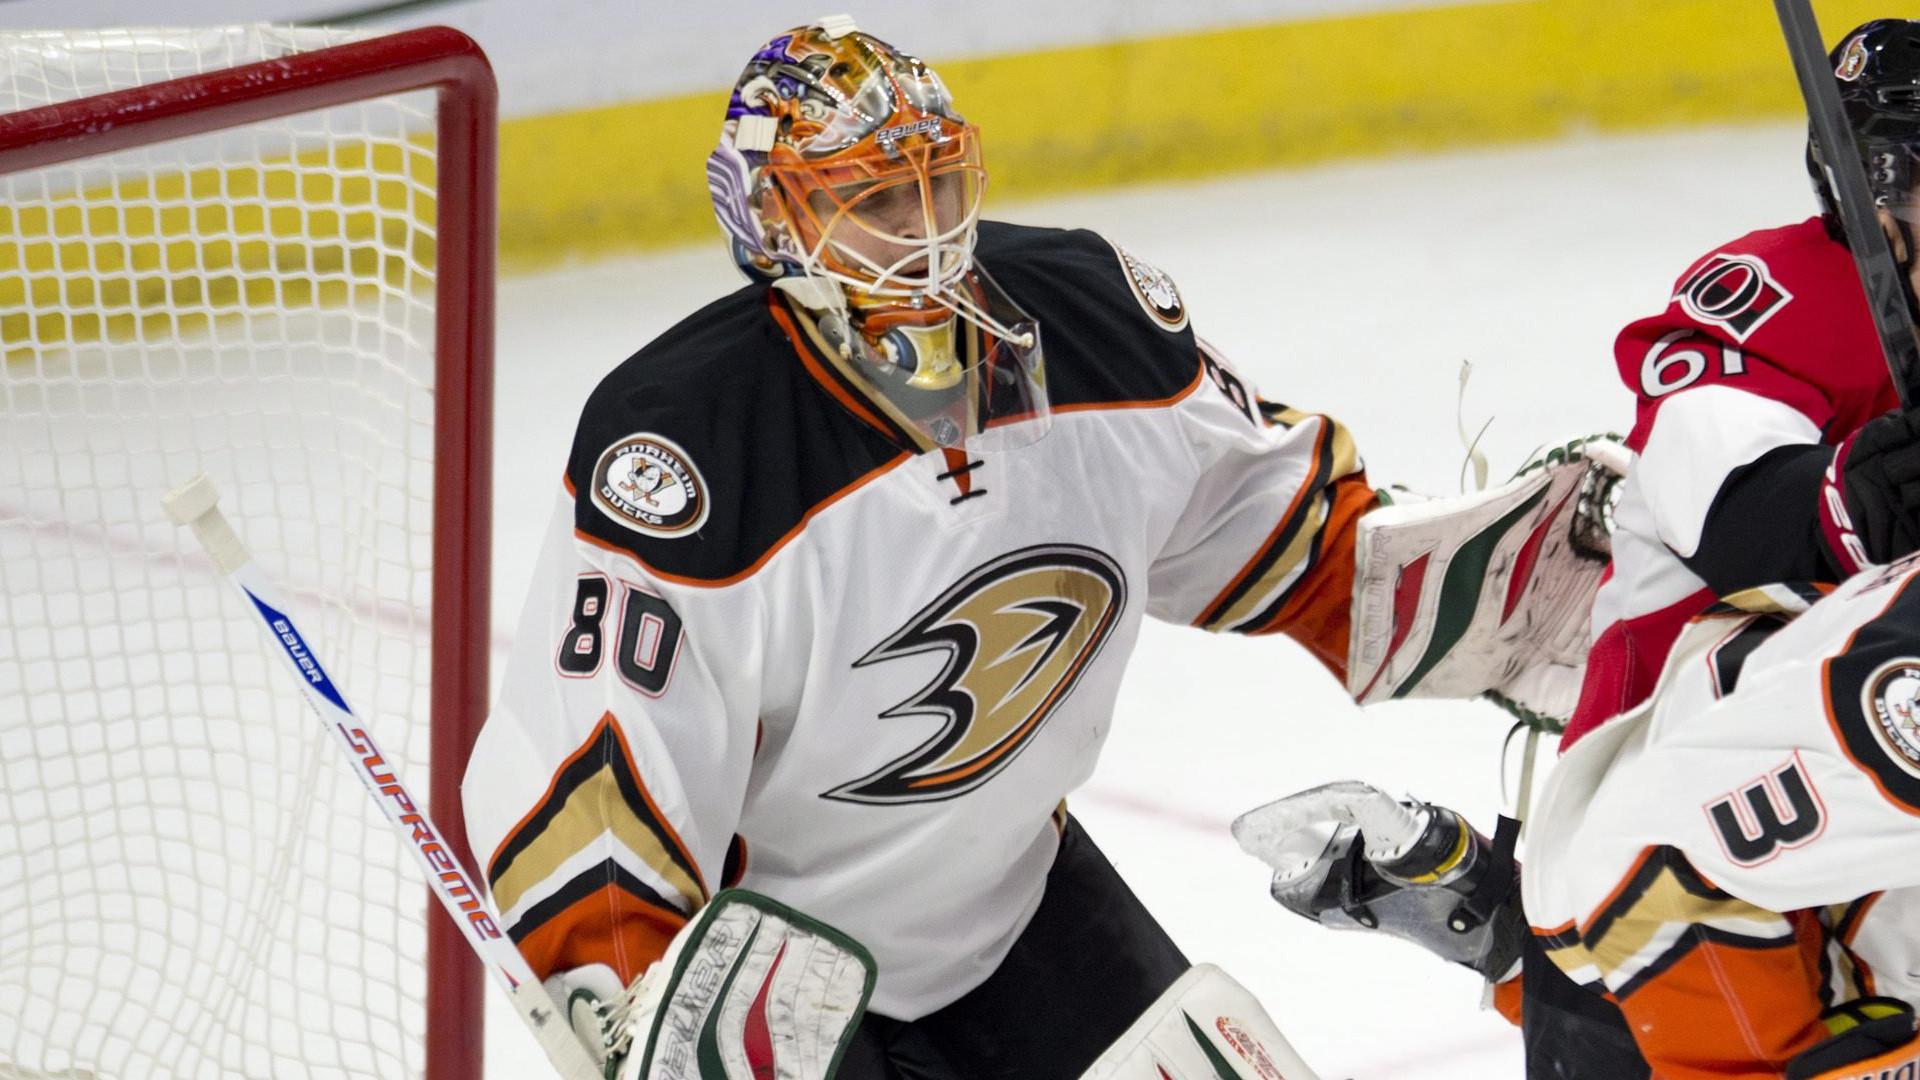 Better-conditioned Ilya Bryzgalov Returns To Ducks' Goal Tonight